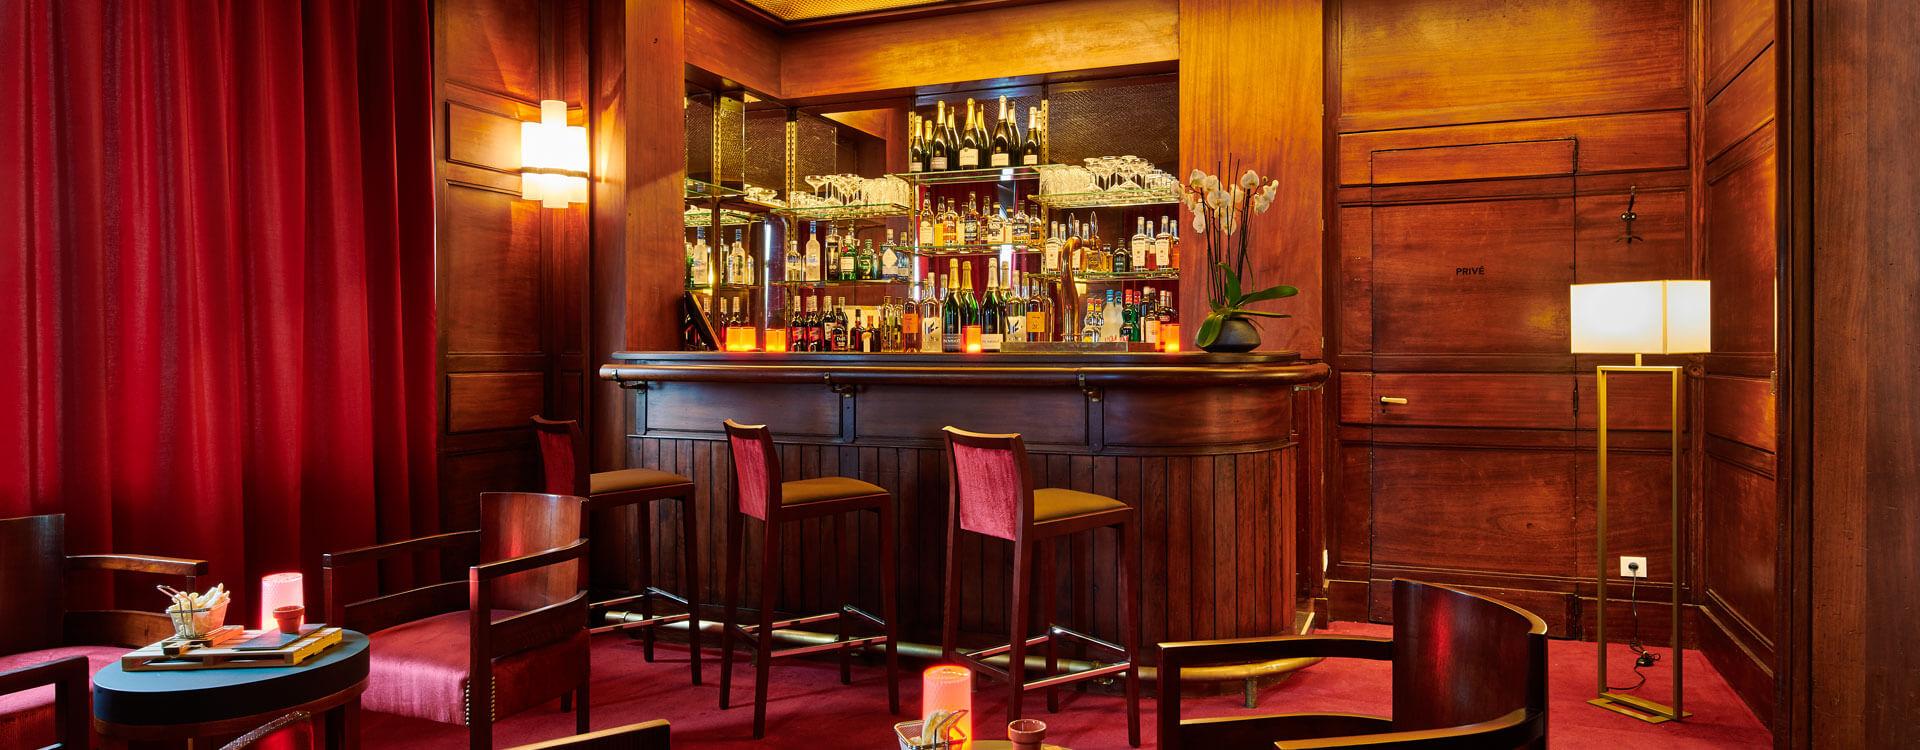 Bar - Hôtel et spa**** Splendid à Dax